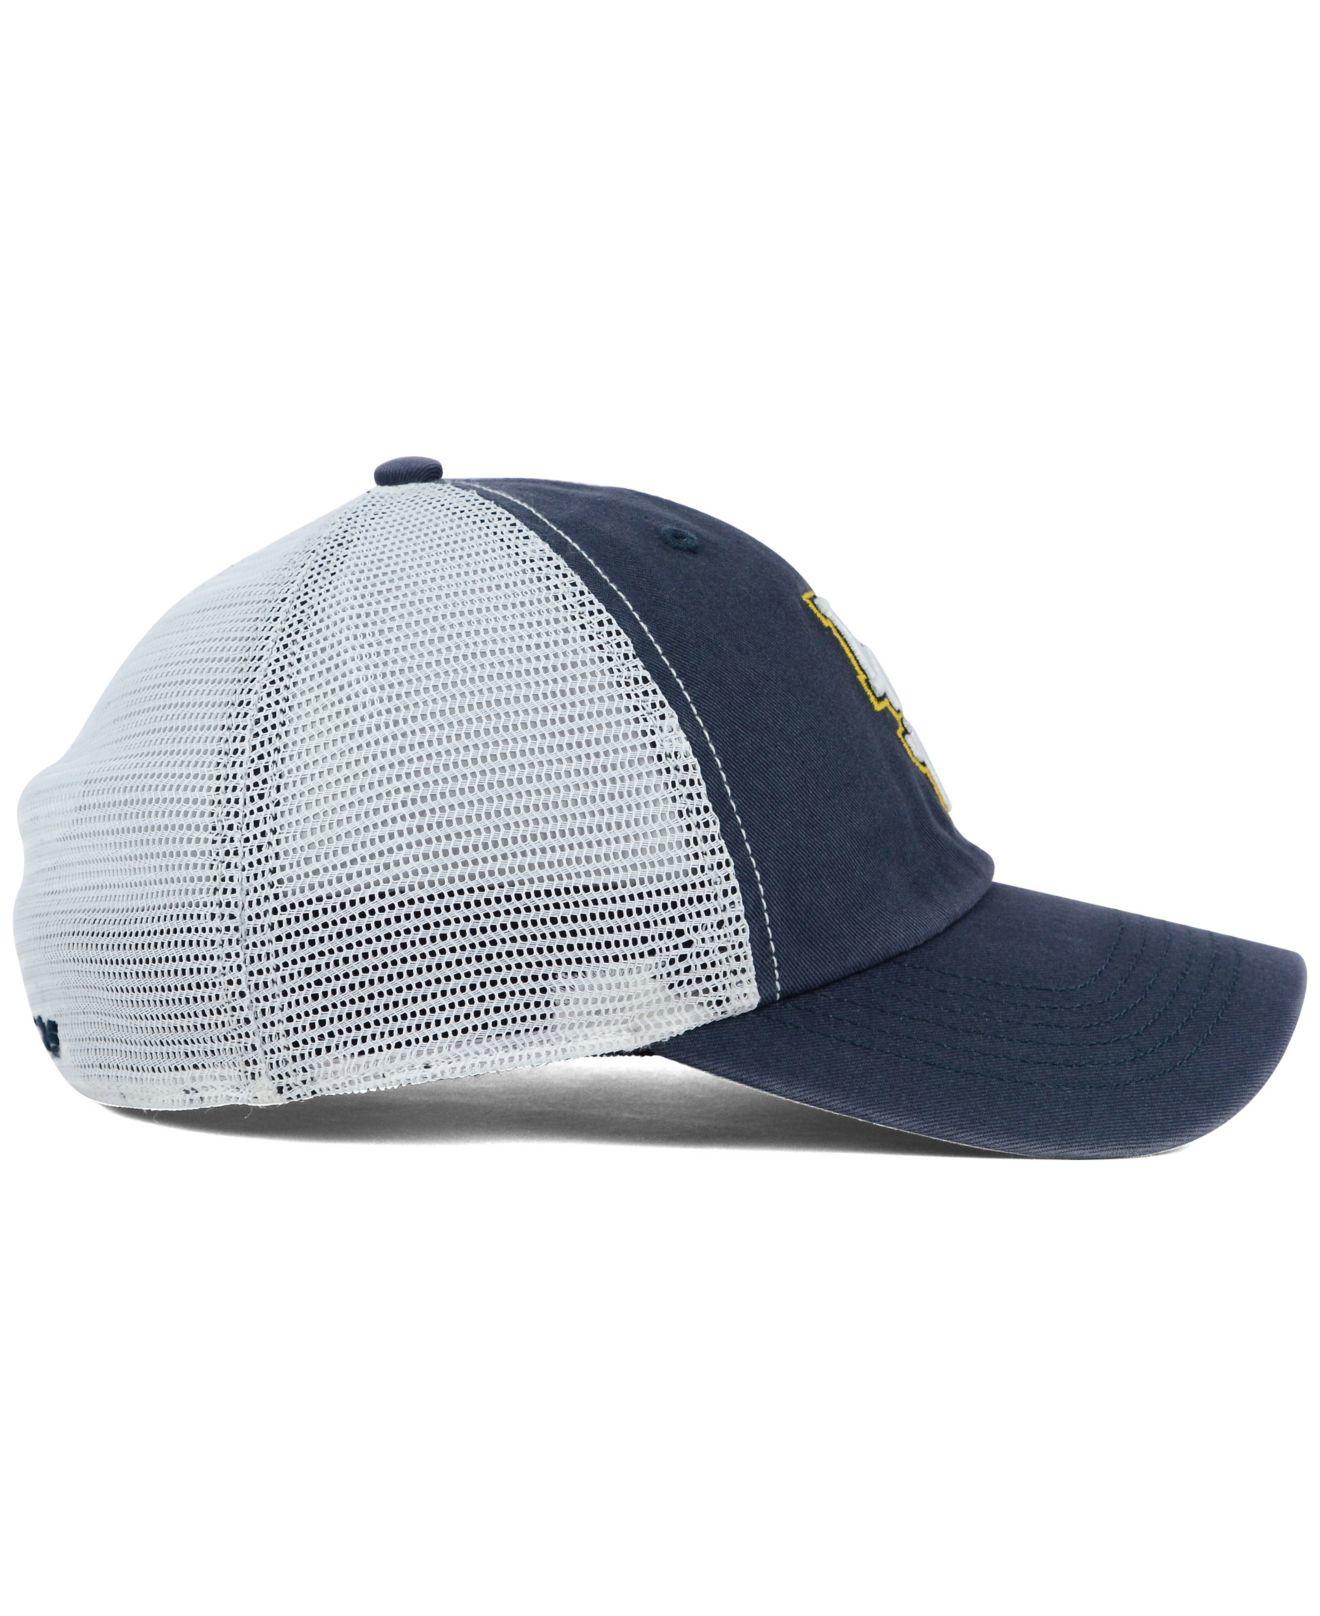 separation shoes 8c82c 8a85c ... good lyst 47 brand lsu tigers stretch fit griffin cap in blue for men  d5b03 37d13